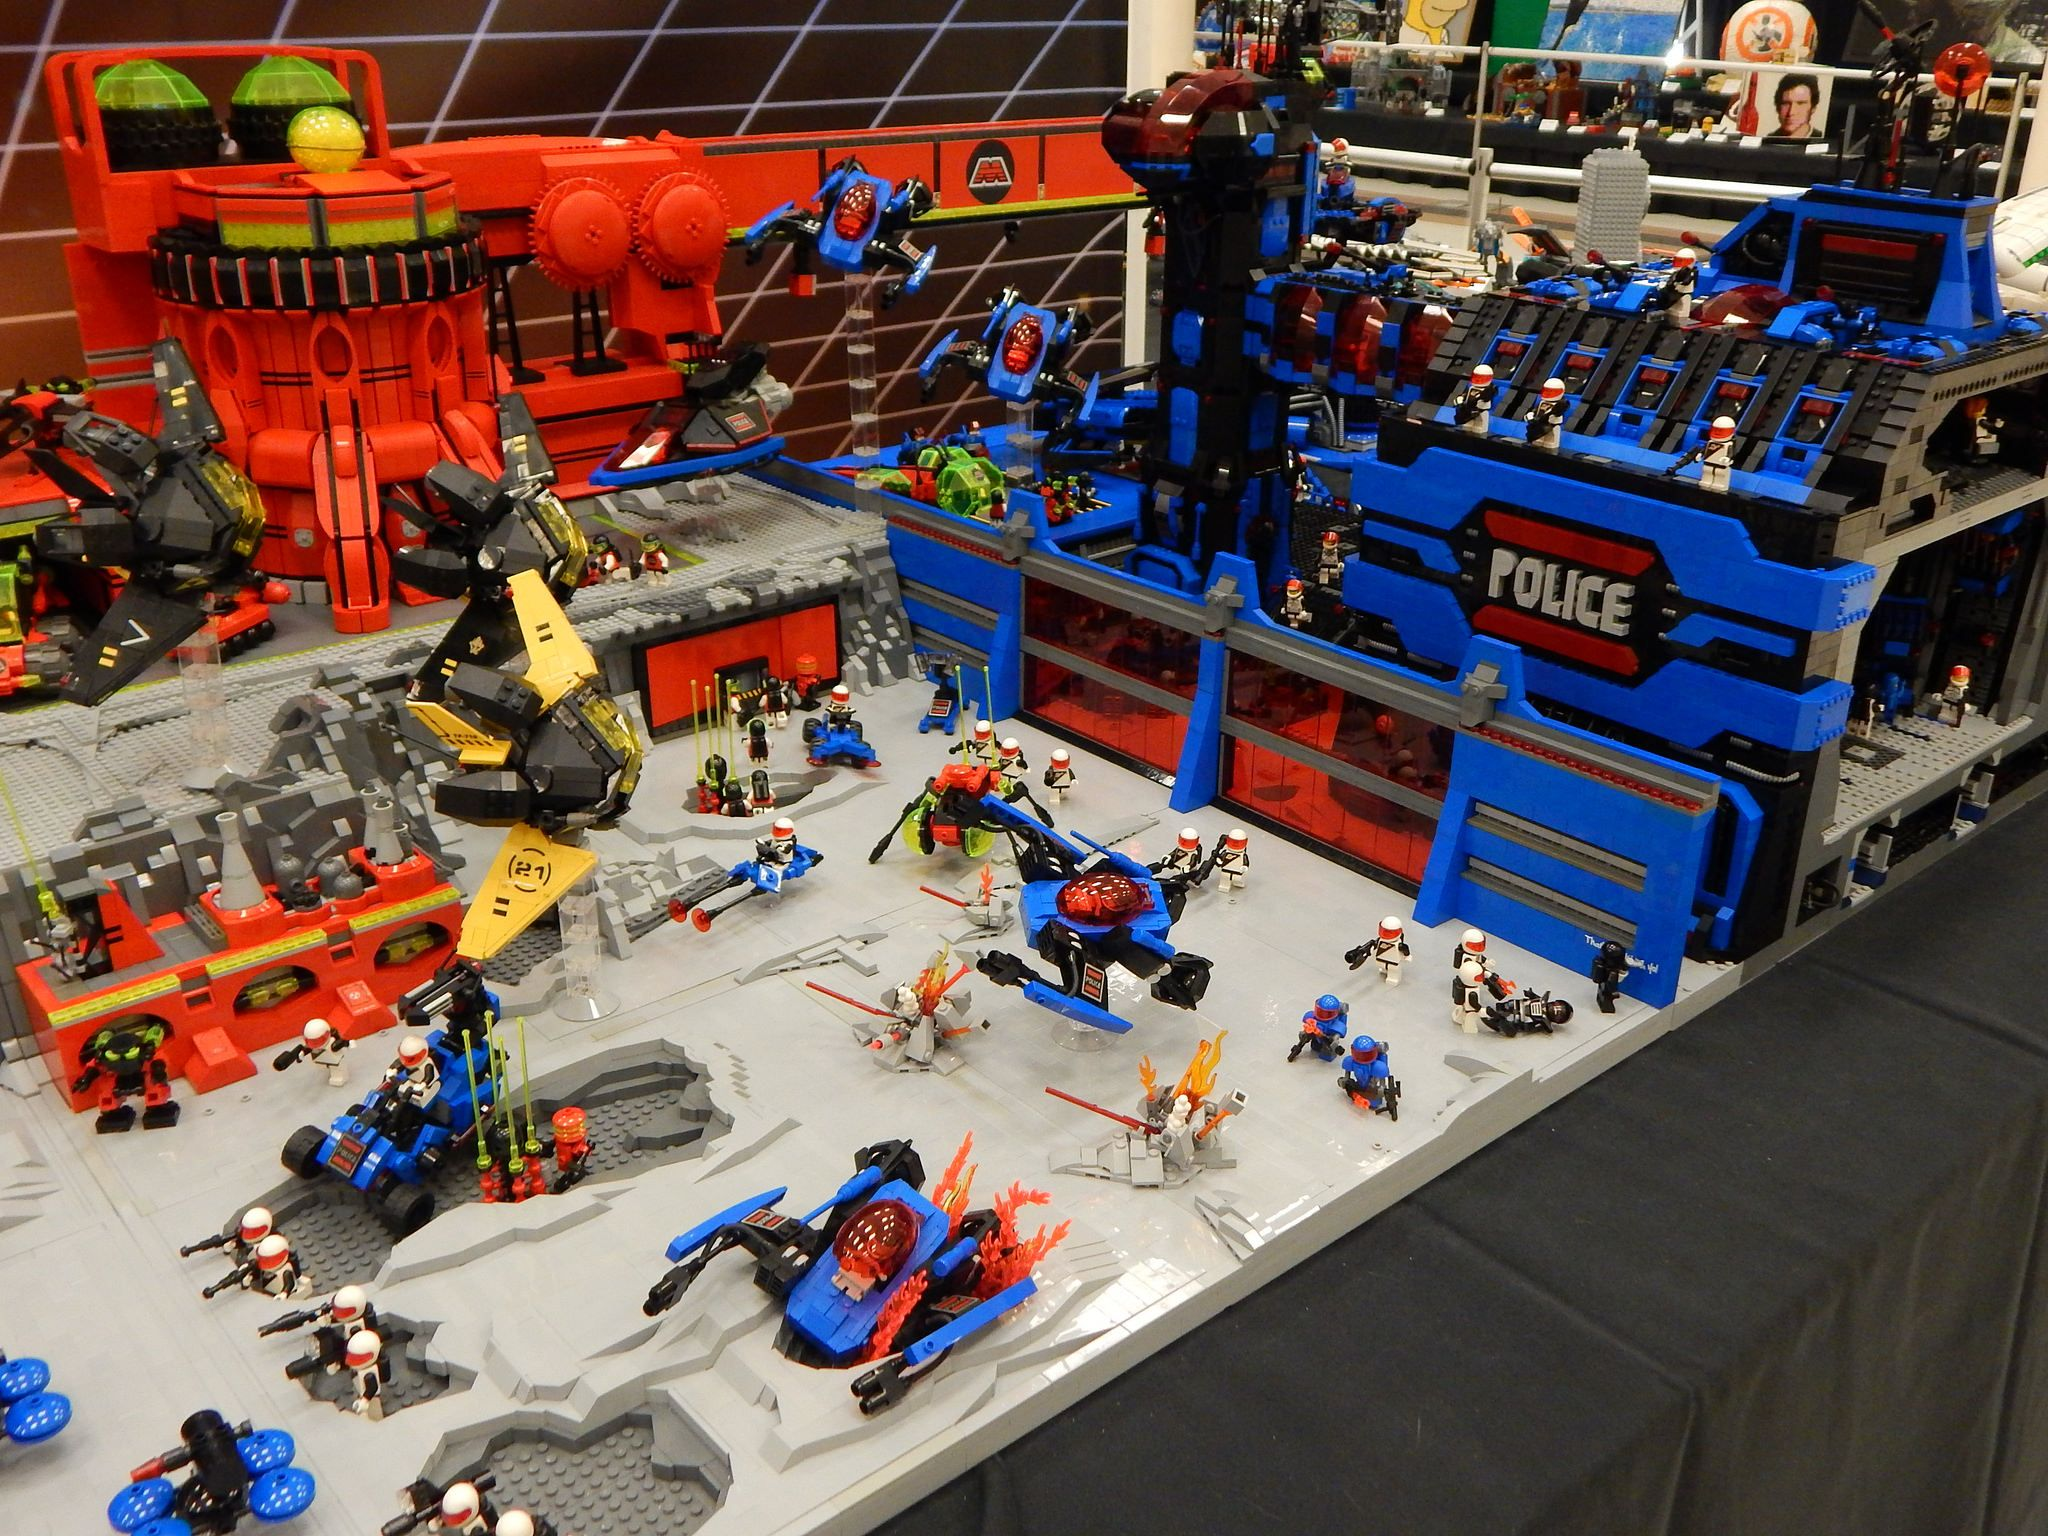 Https Flic Kr P Nekrwp Brickcon 2016 Lego Space Station Lego Space Classic Lego